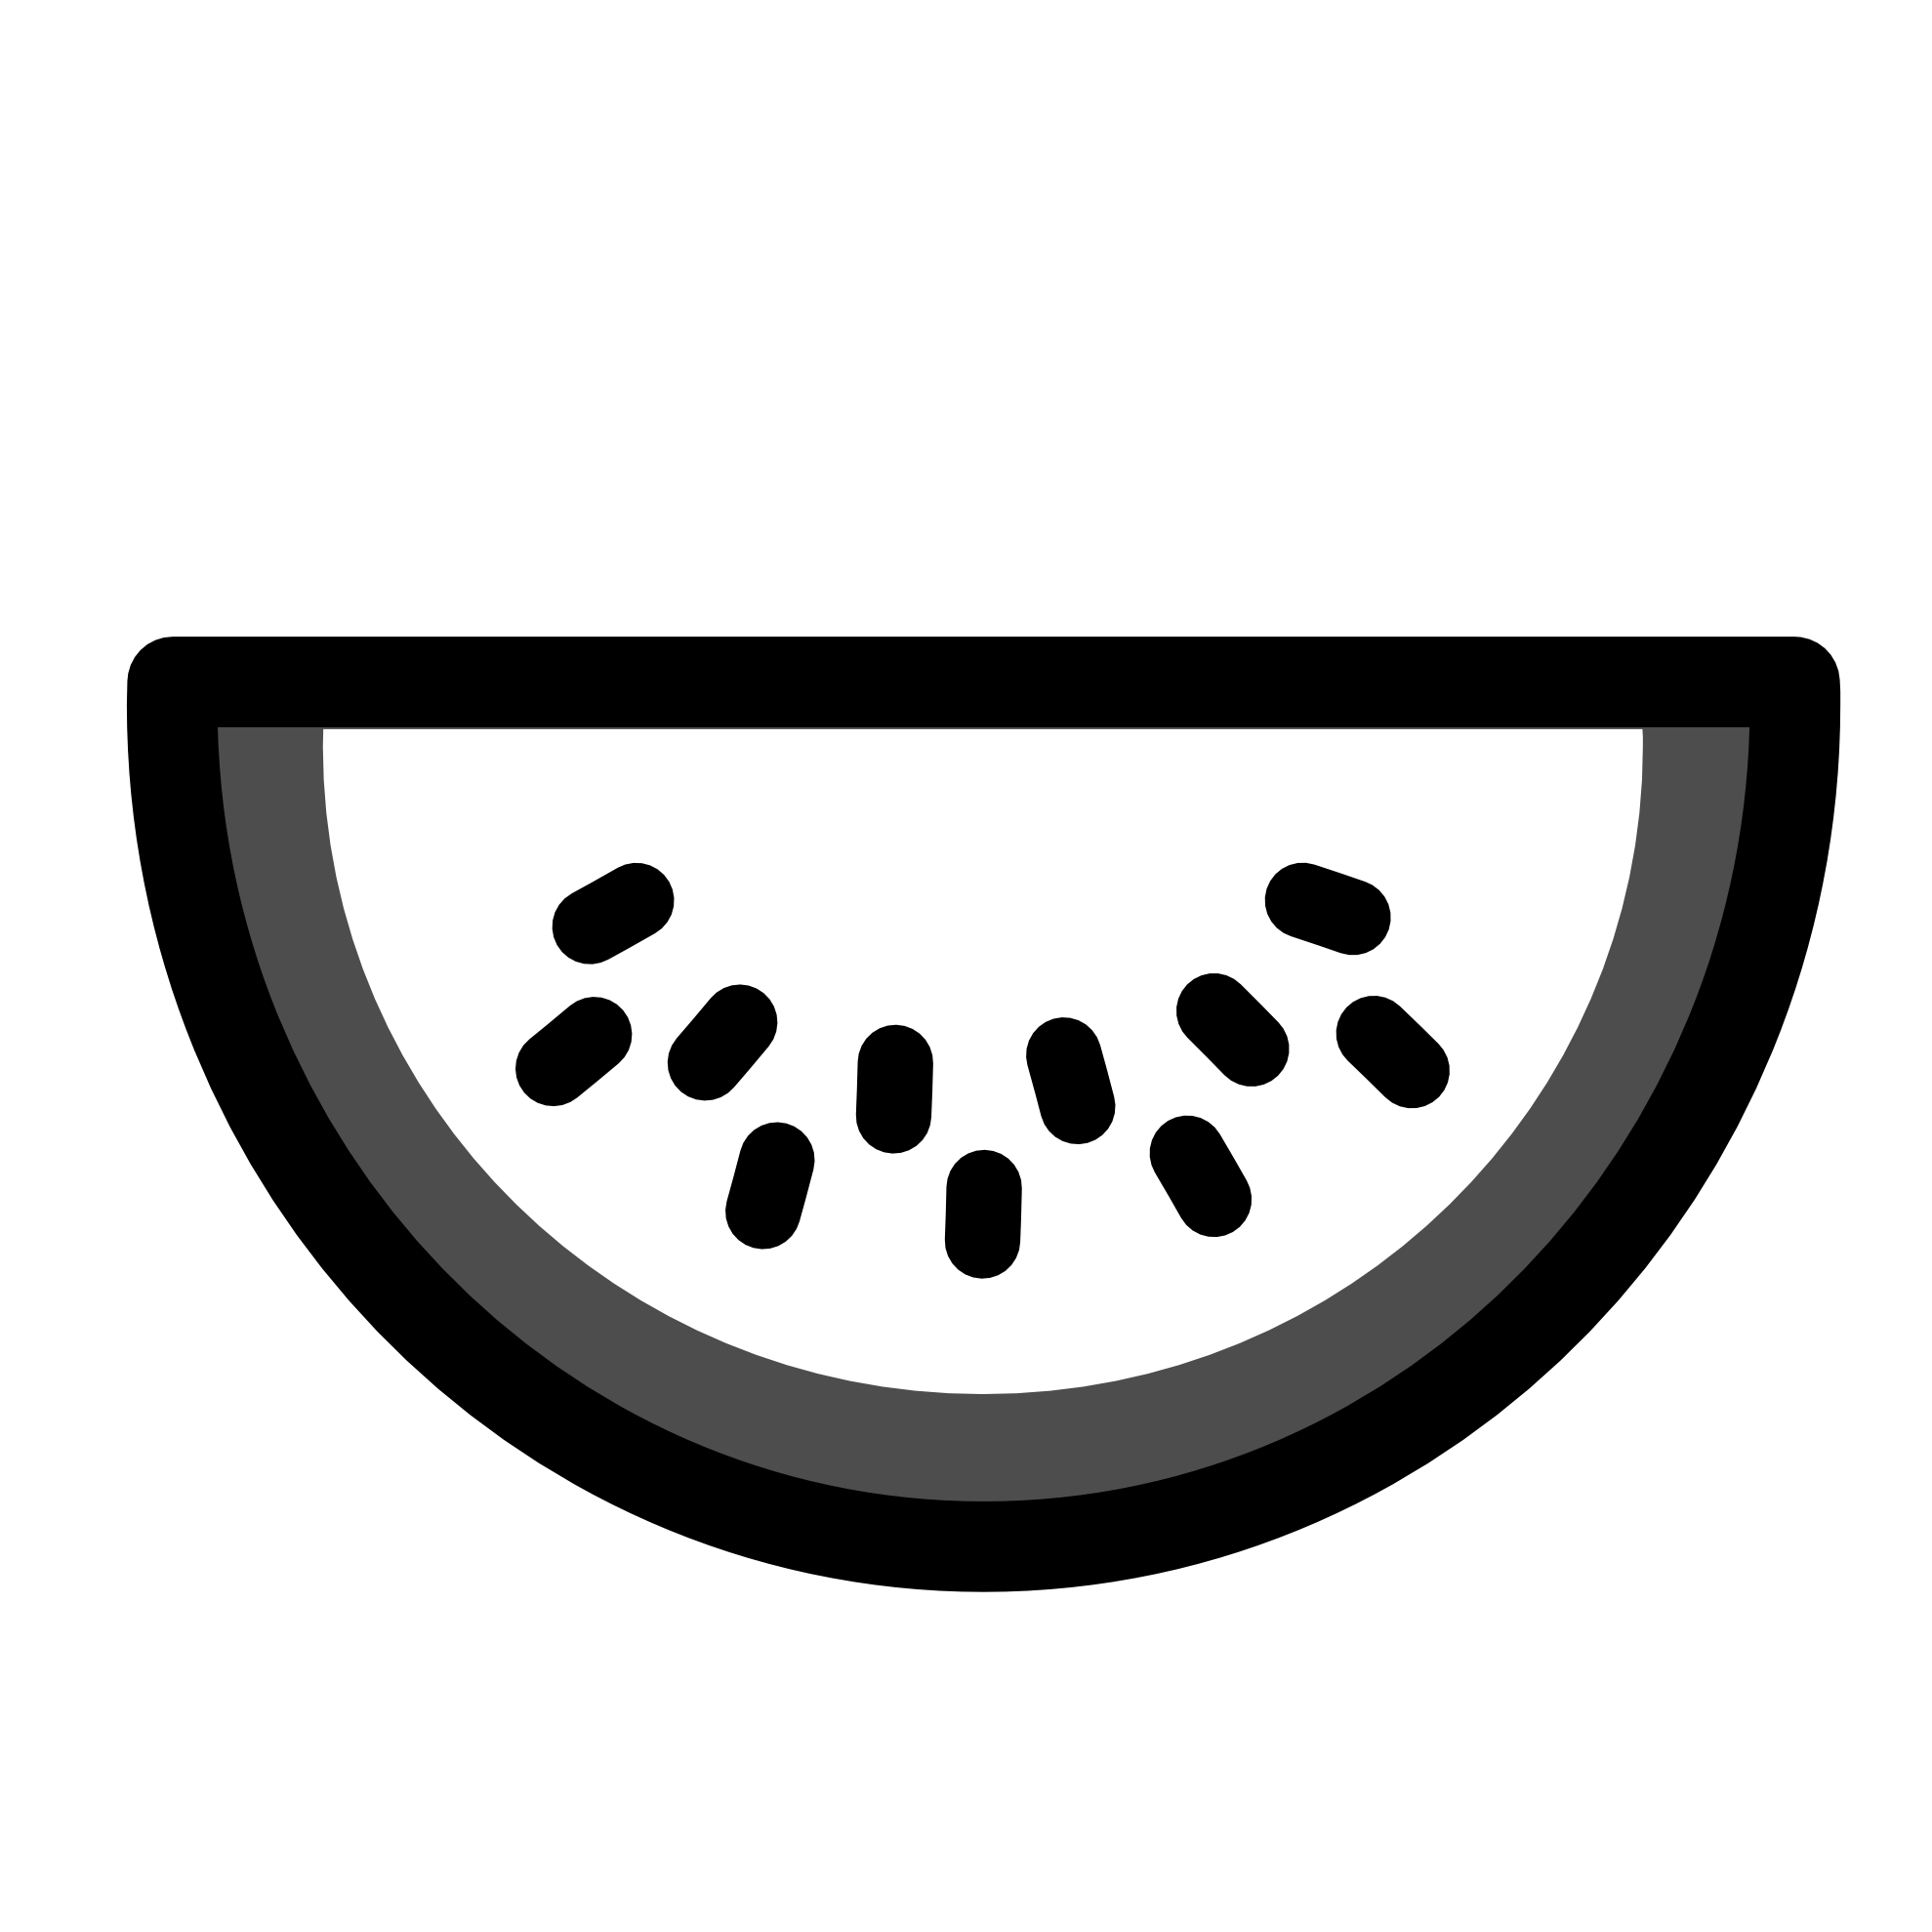 Clipart panda black and white. Book icon